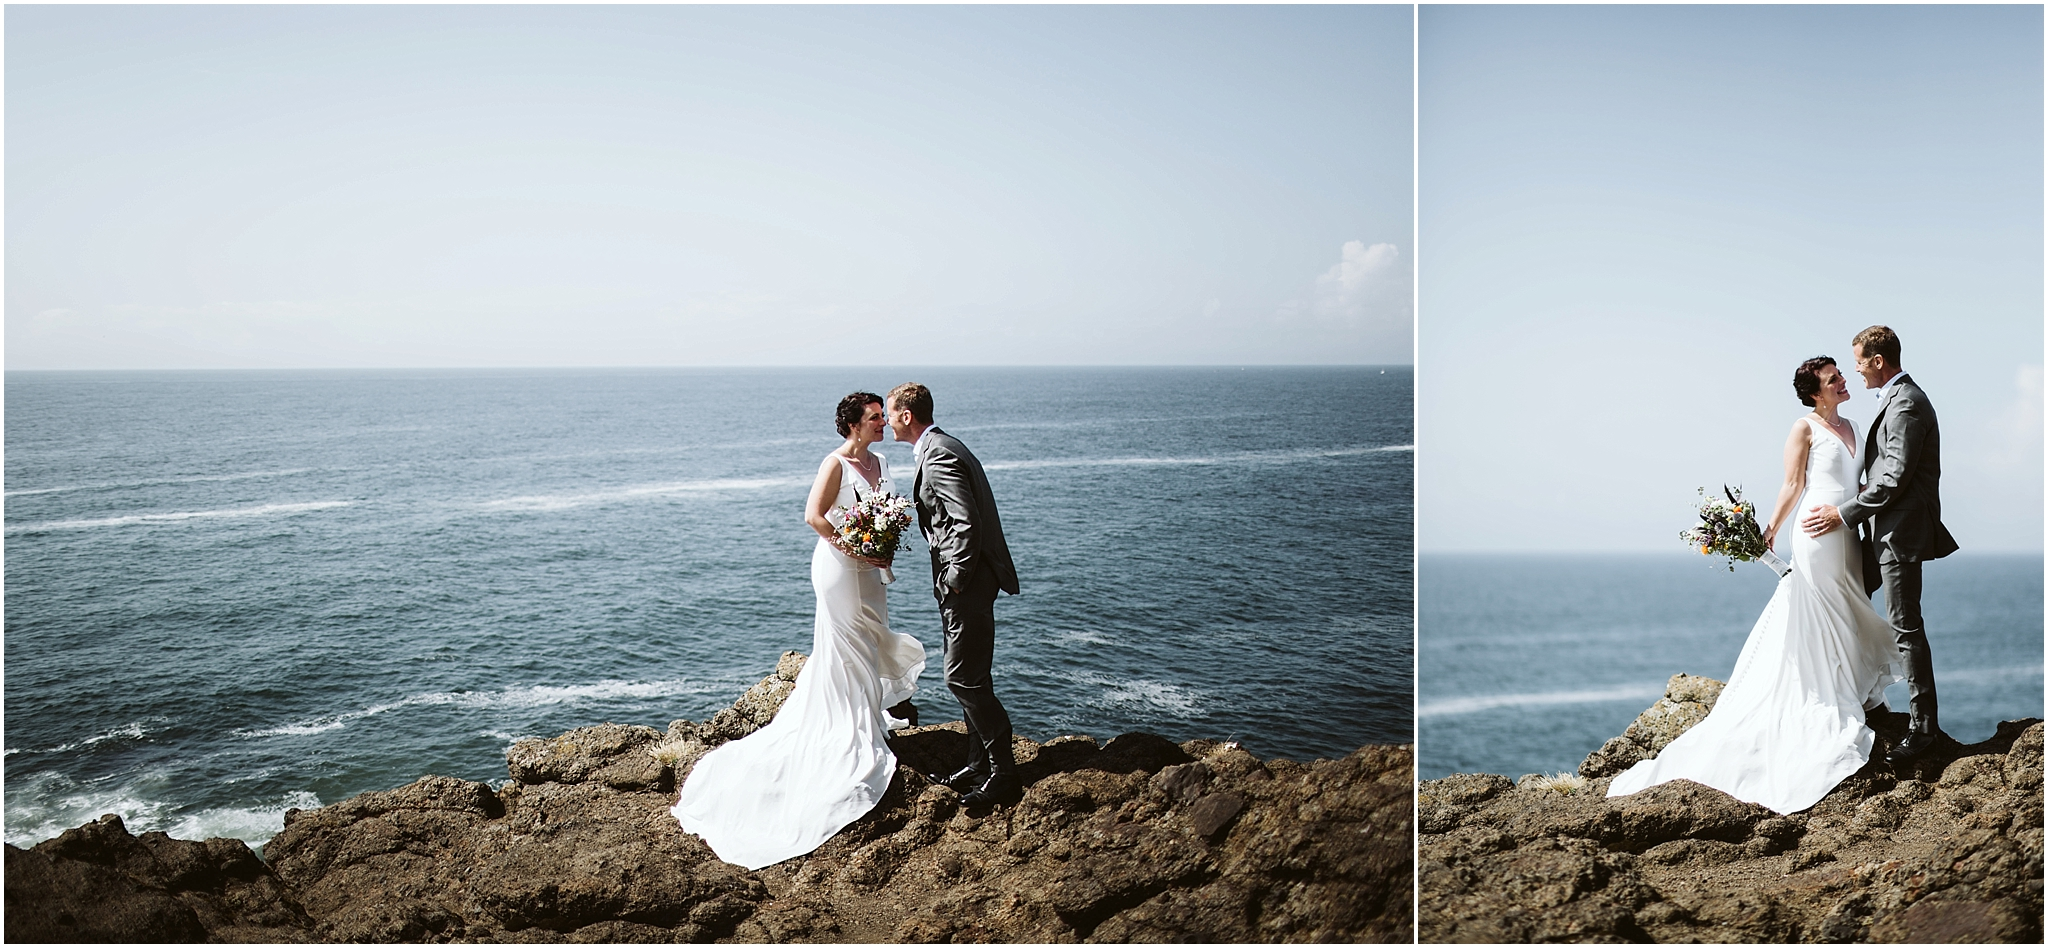 Oregon Coast Intimate Wedding | oregon elopement photographer | oregon elopement13.jpg